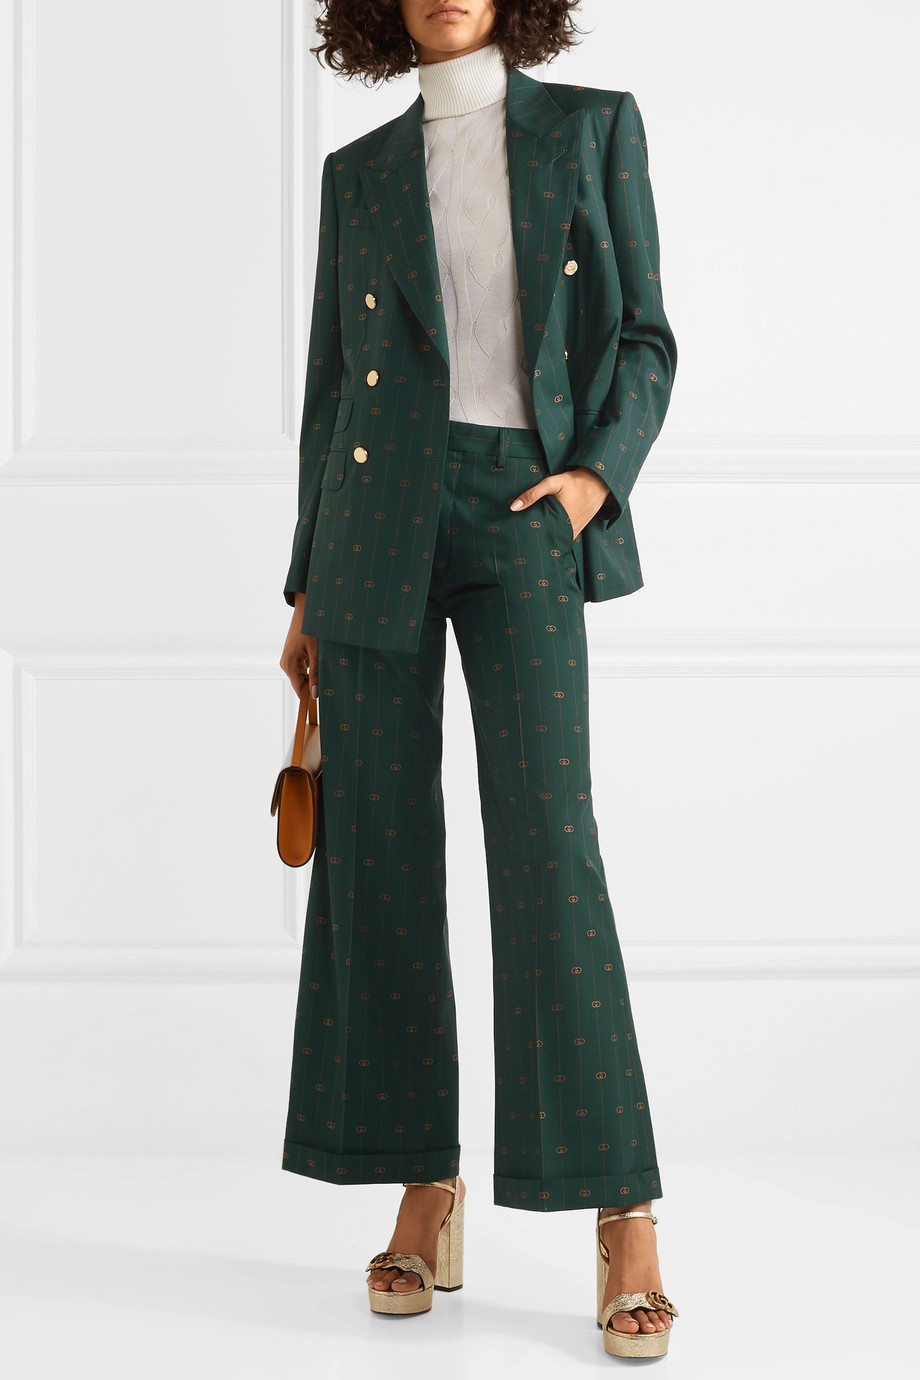 Gucci Wool-jacquard wide-leg pants